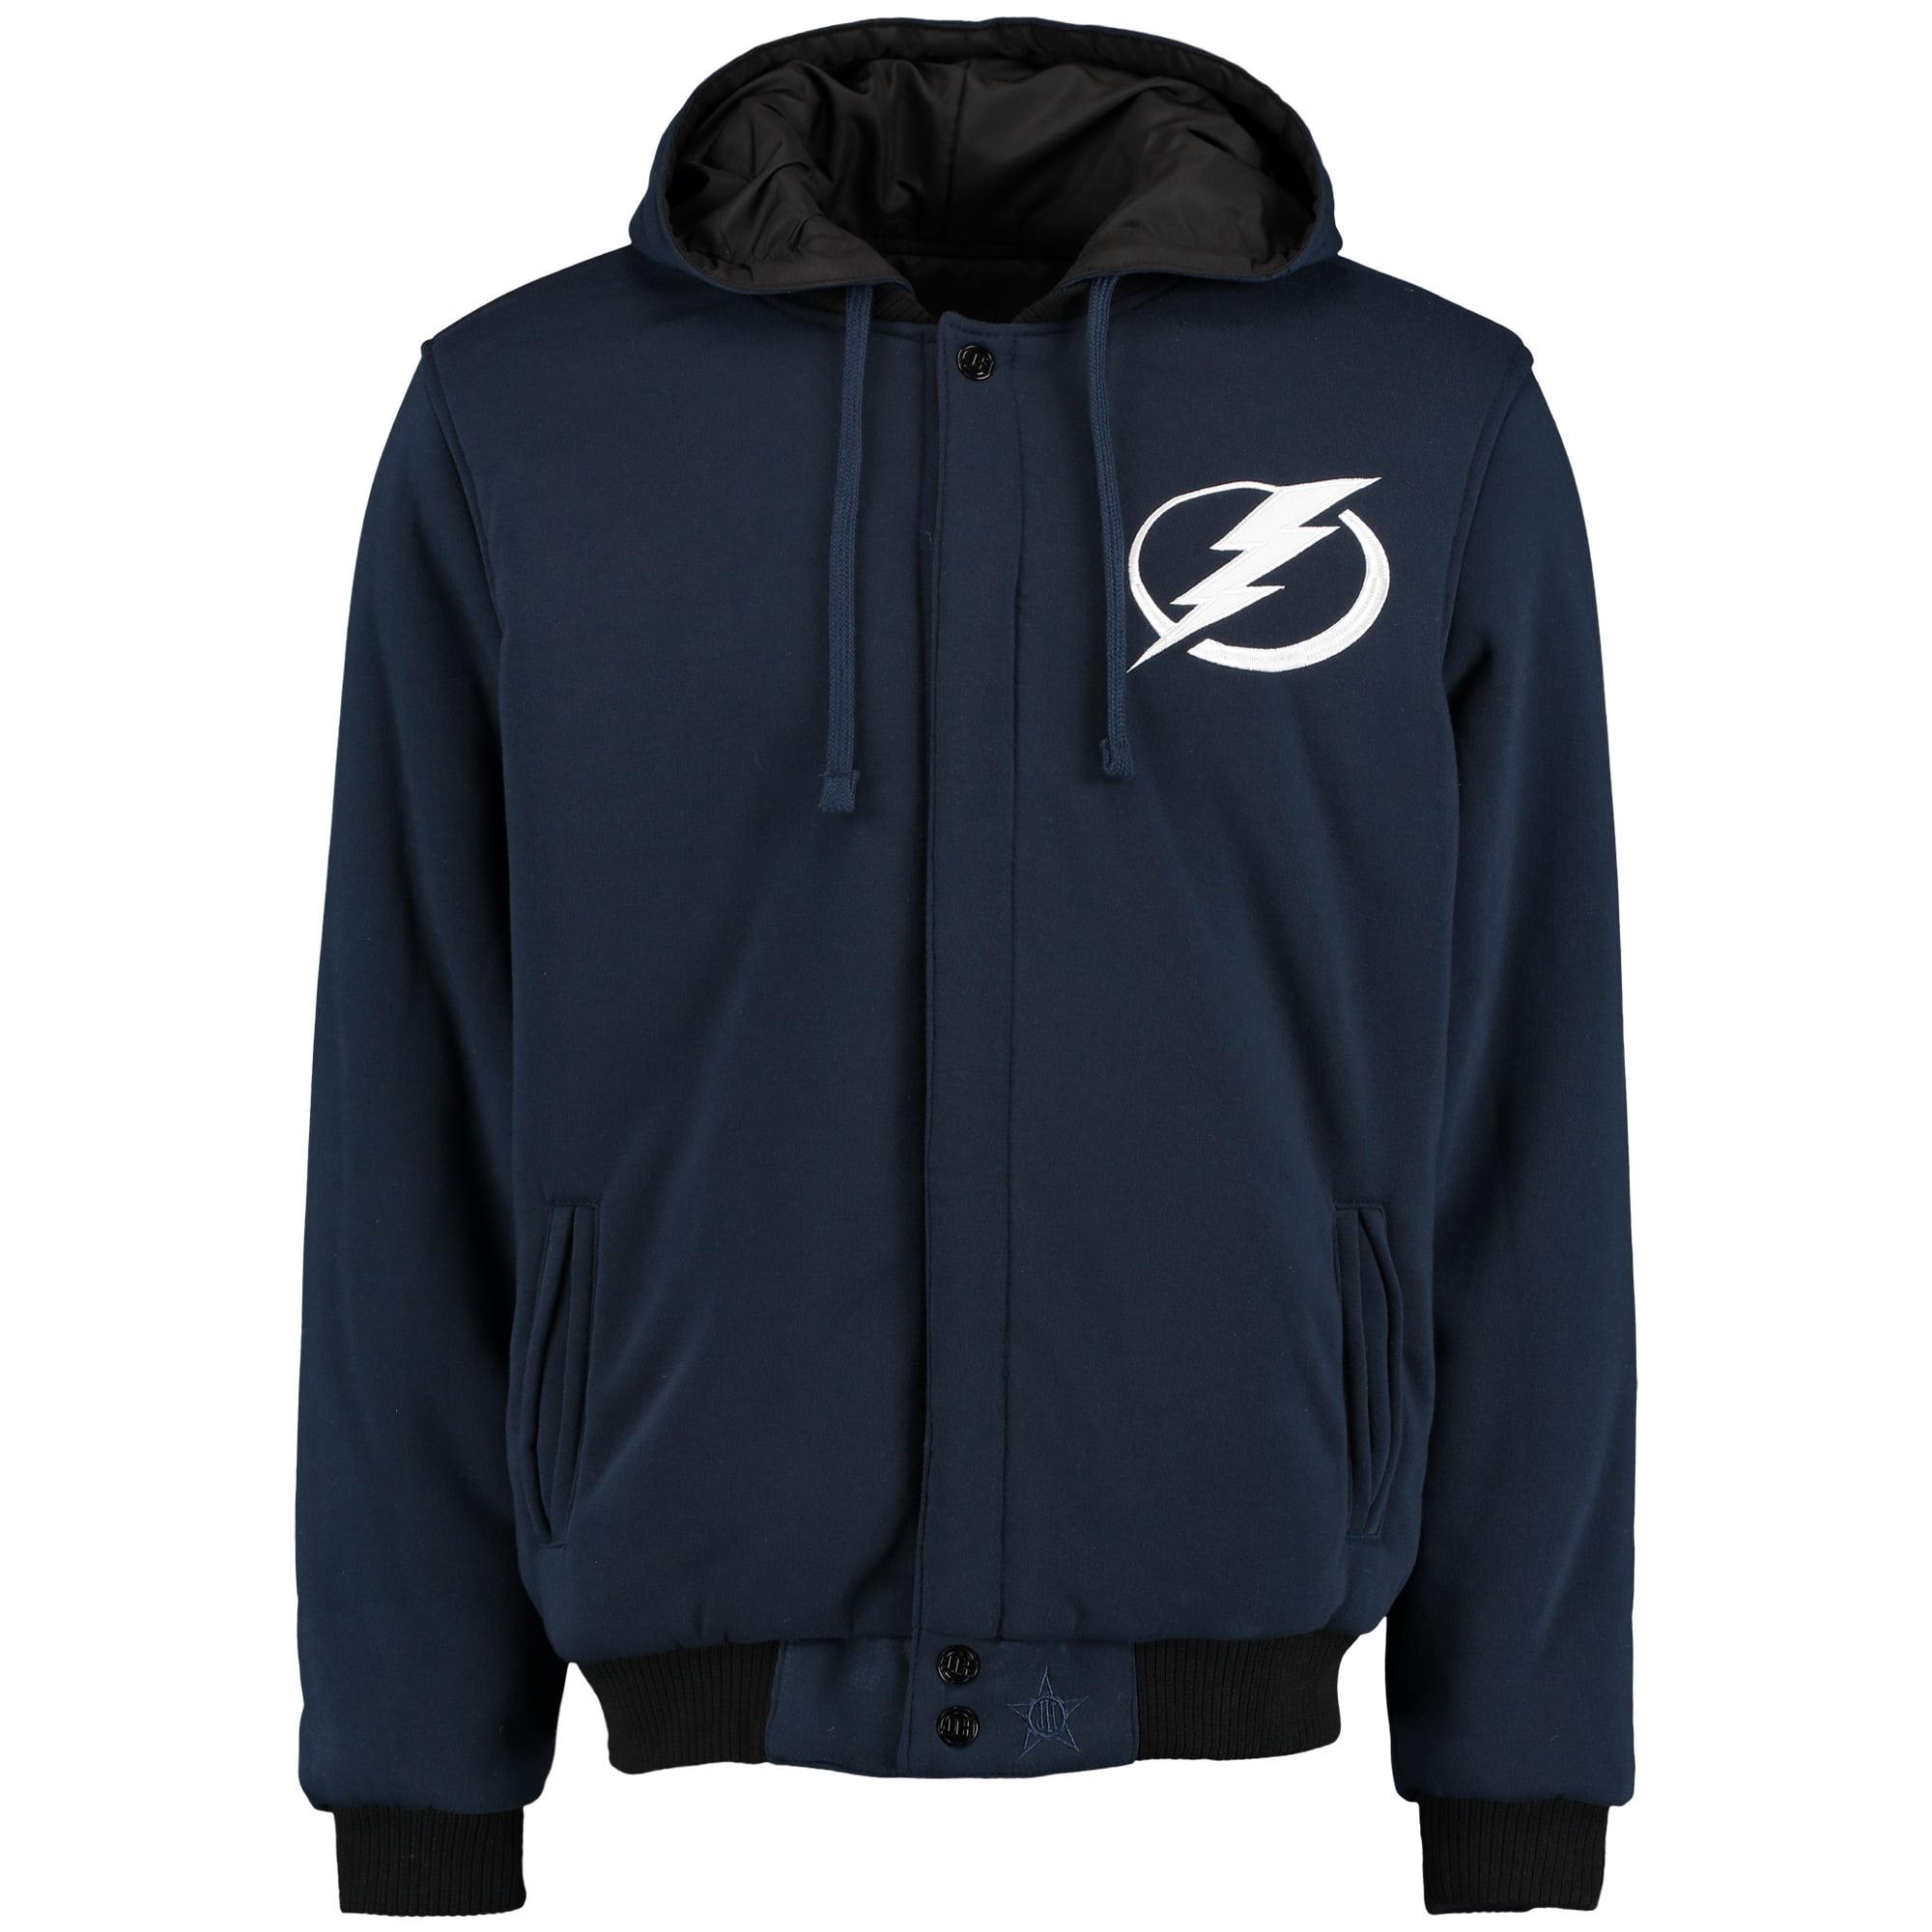 Men's JH Design Navy Tampa Bay Lightning Fleece-Nylon Reversible Jacket by JH Design Group